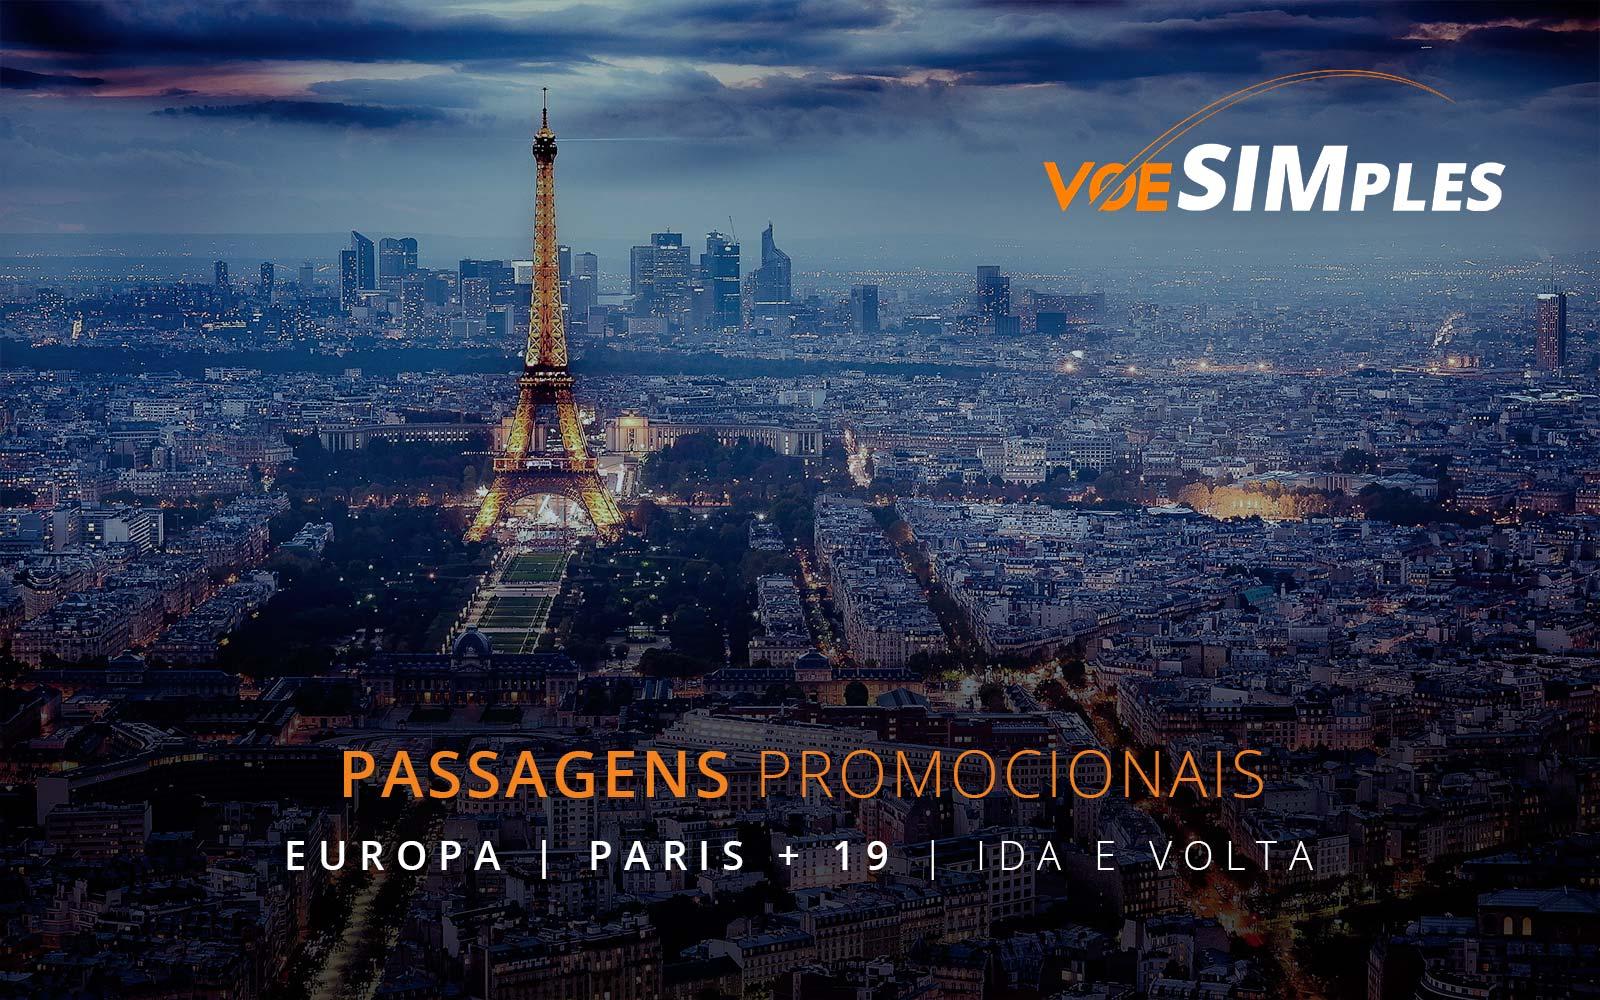 Passagens aéreas promocionais para Barcelona, Paris, Londres, Roma e Veneza na Europa